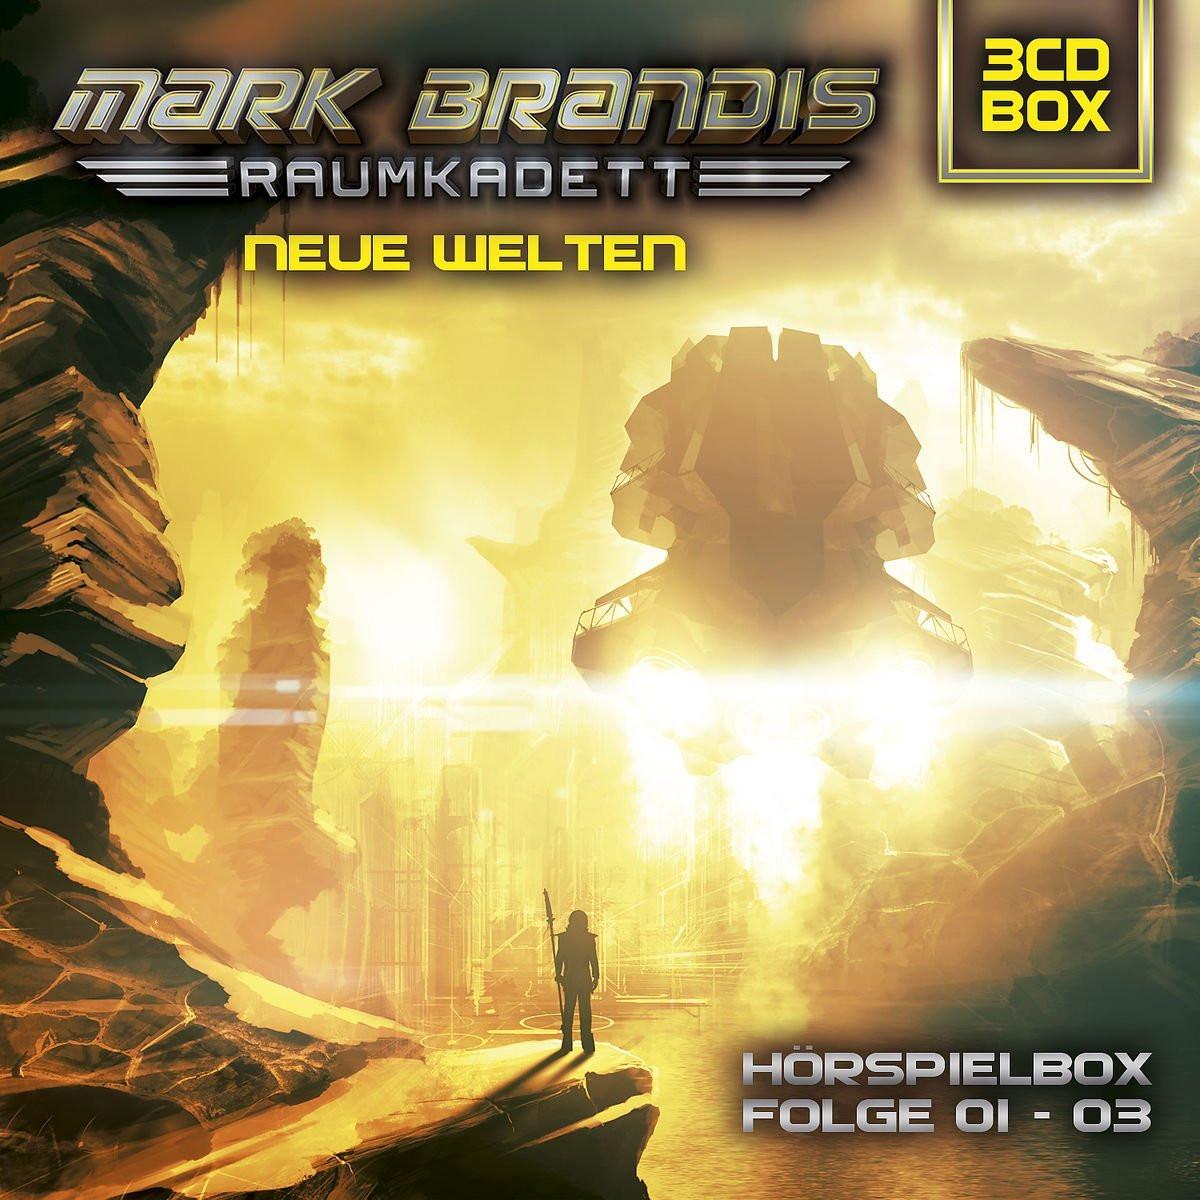 Mark Brandis - Raumkadett - Neue Welten - Folge 1 bis 3 (3er CD-Box)